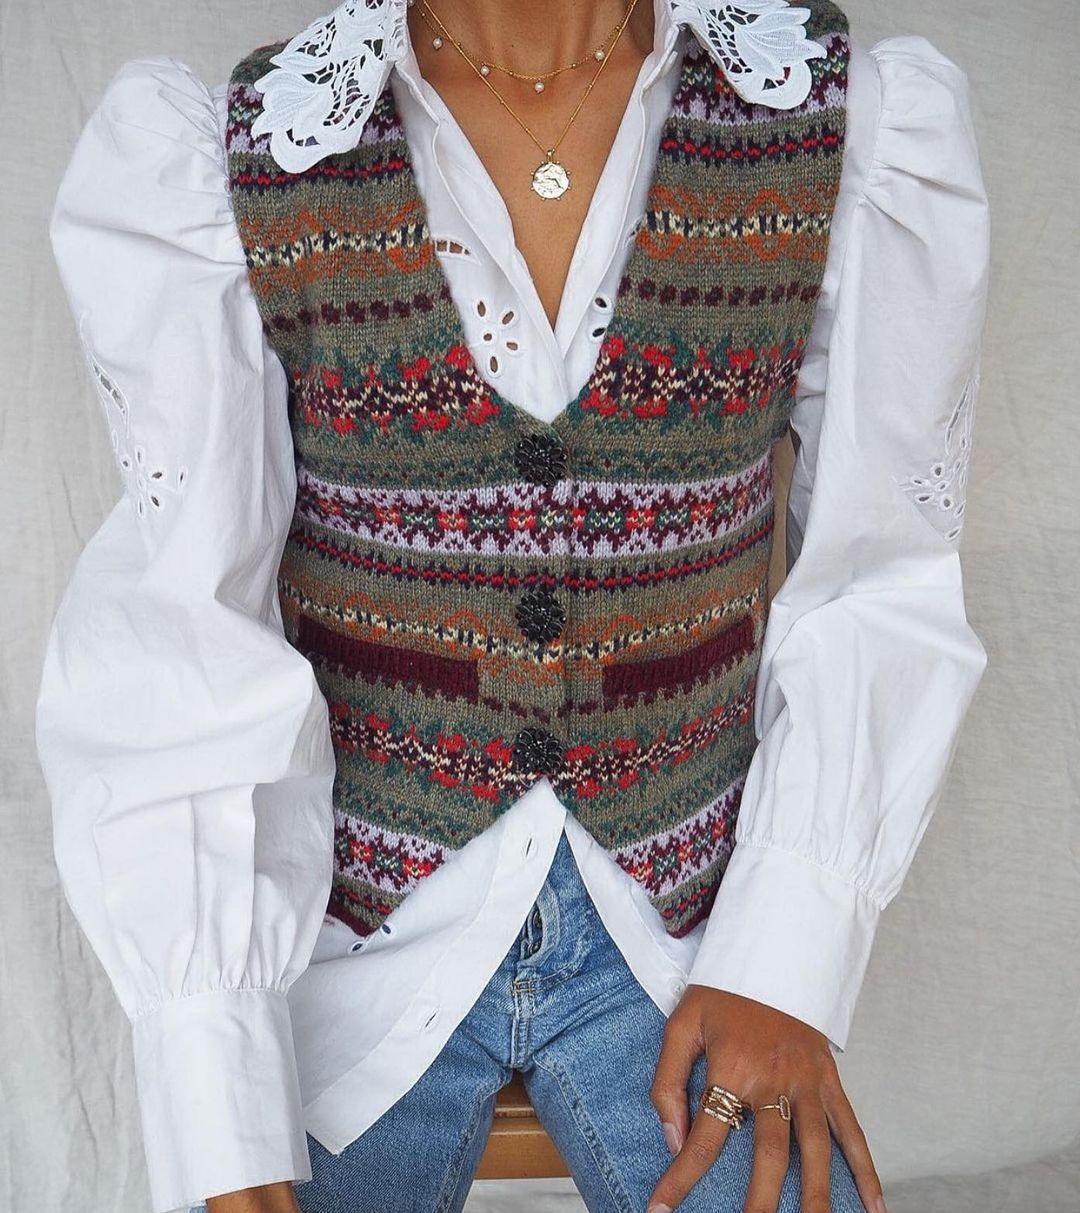 jacquard knit sleeveless vest de Zara sur zaraaddiction